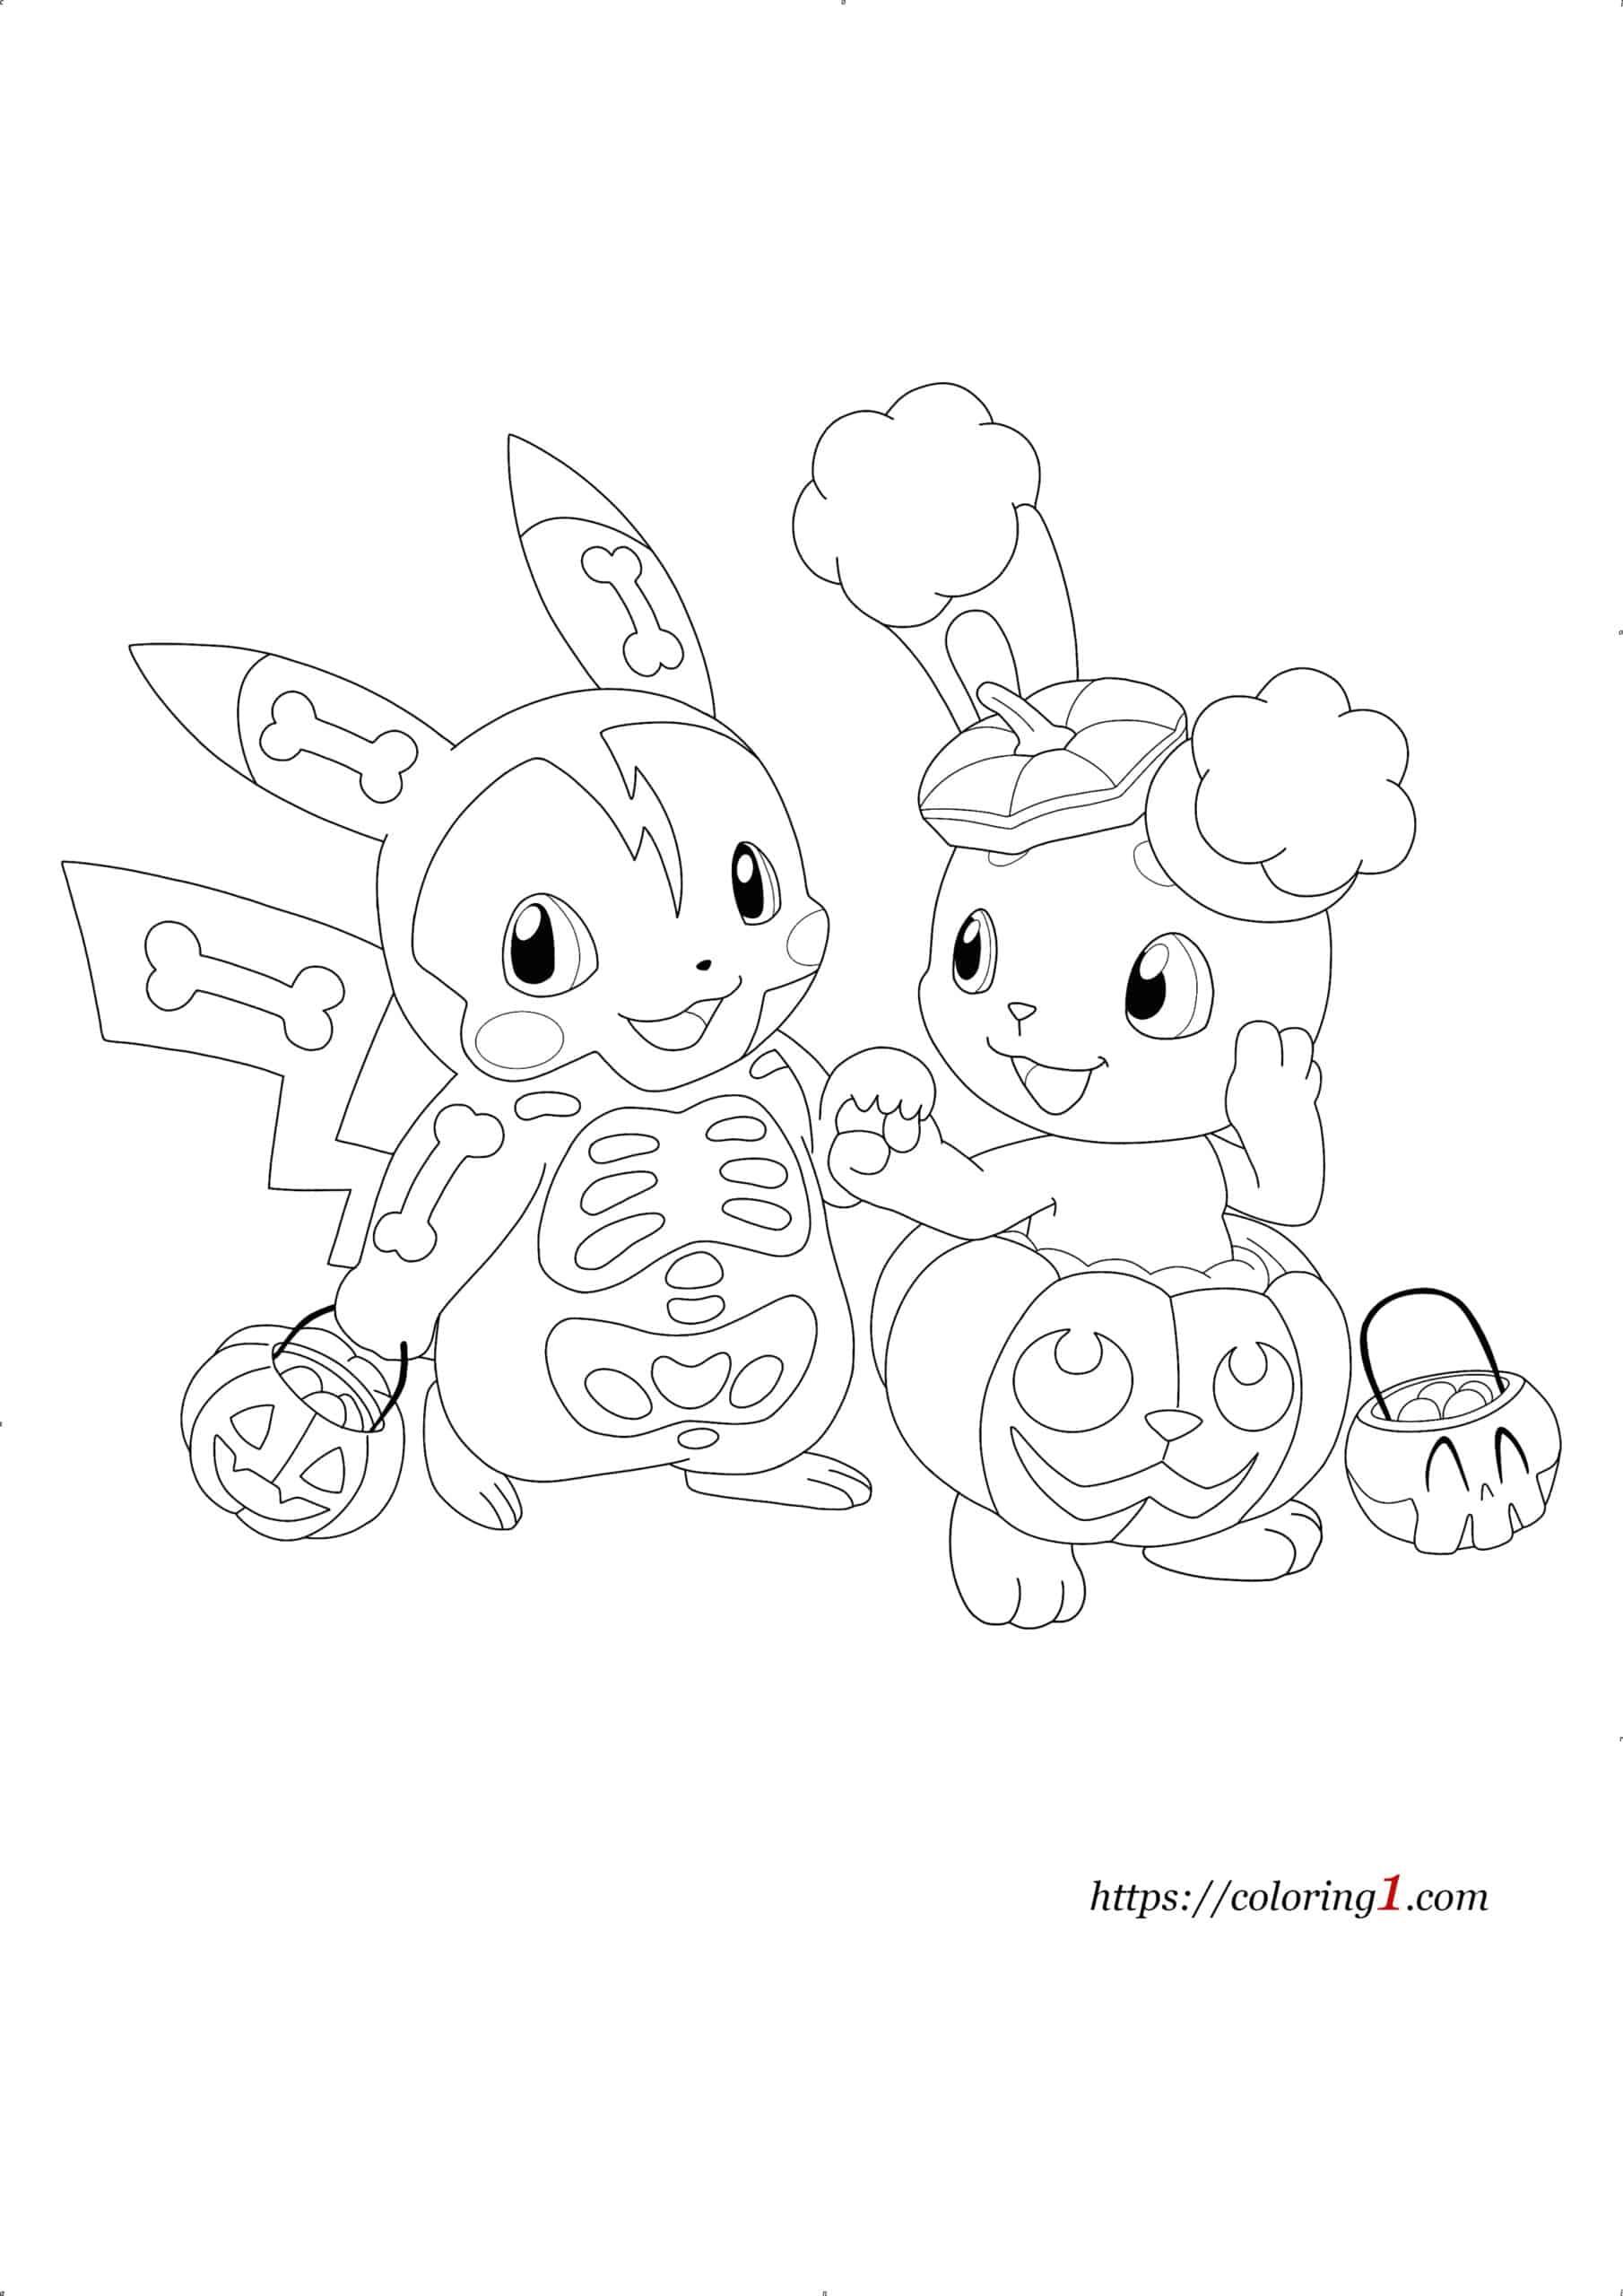 Pokemon Halloween coloring page to print